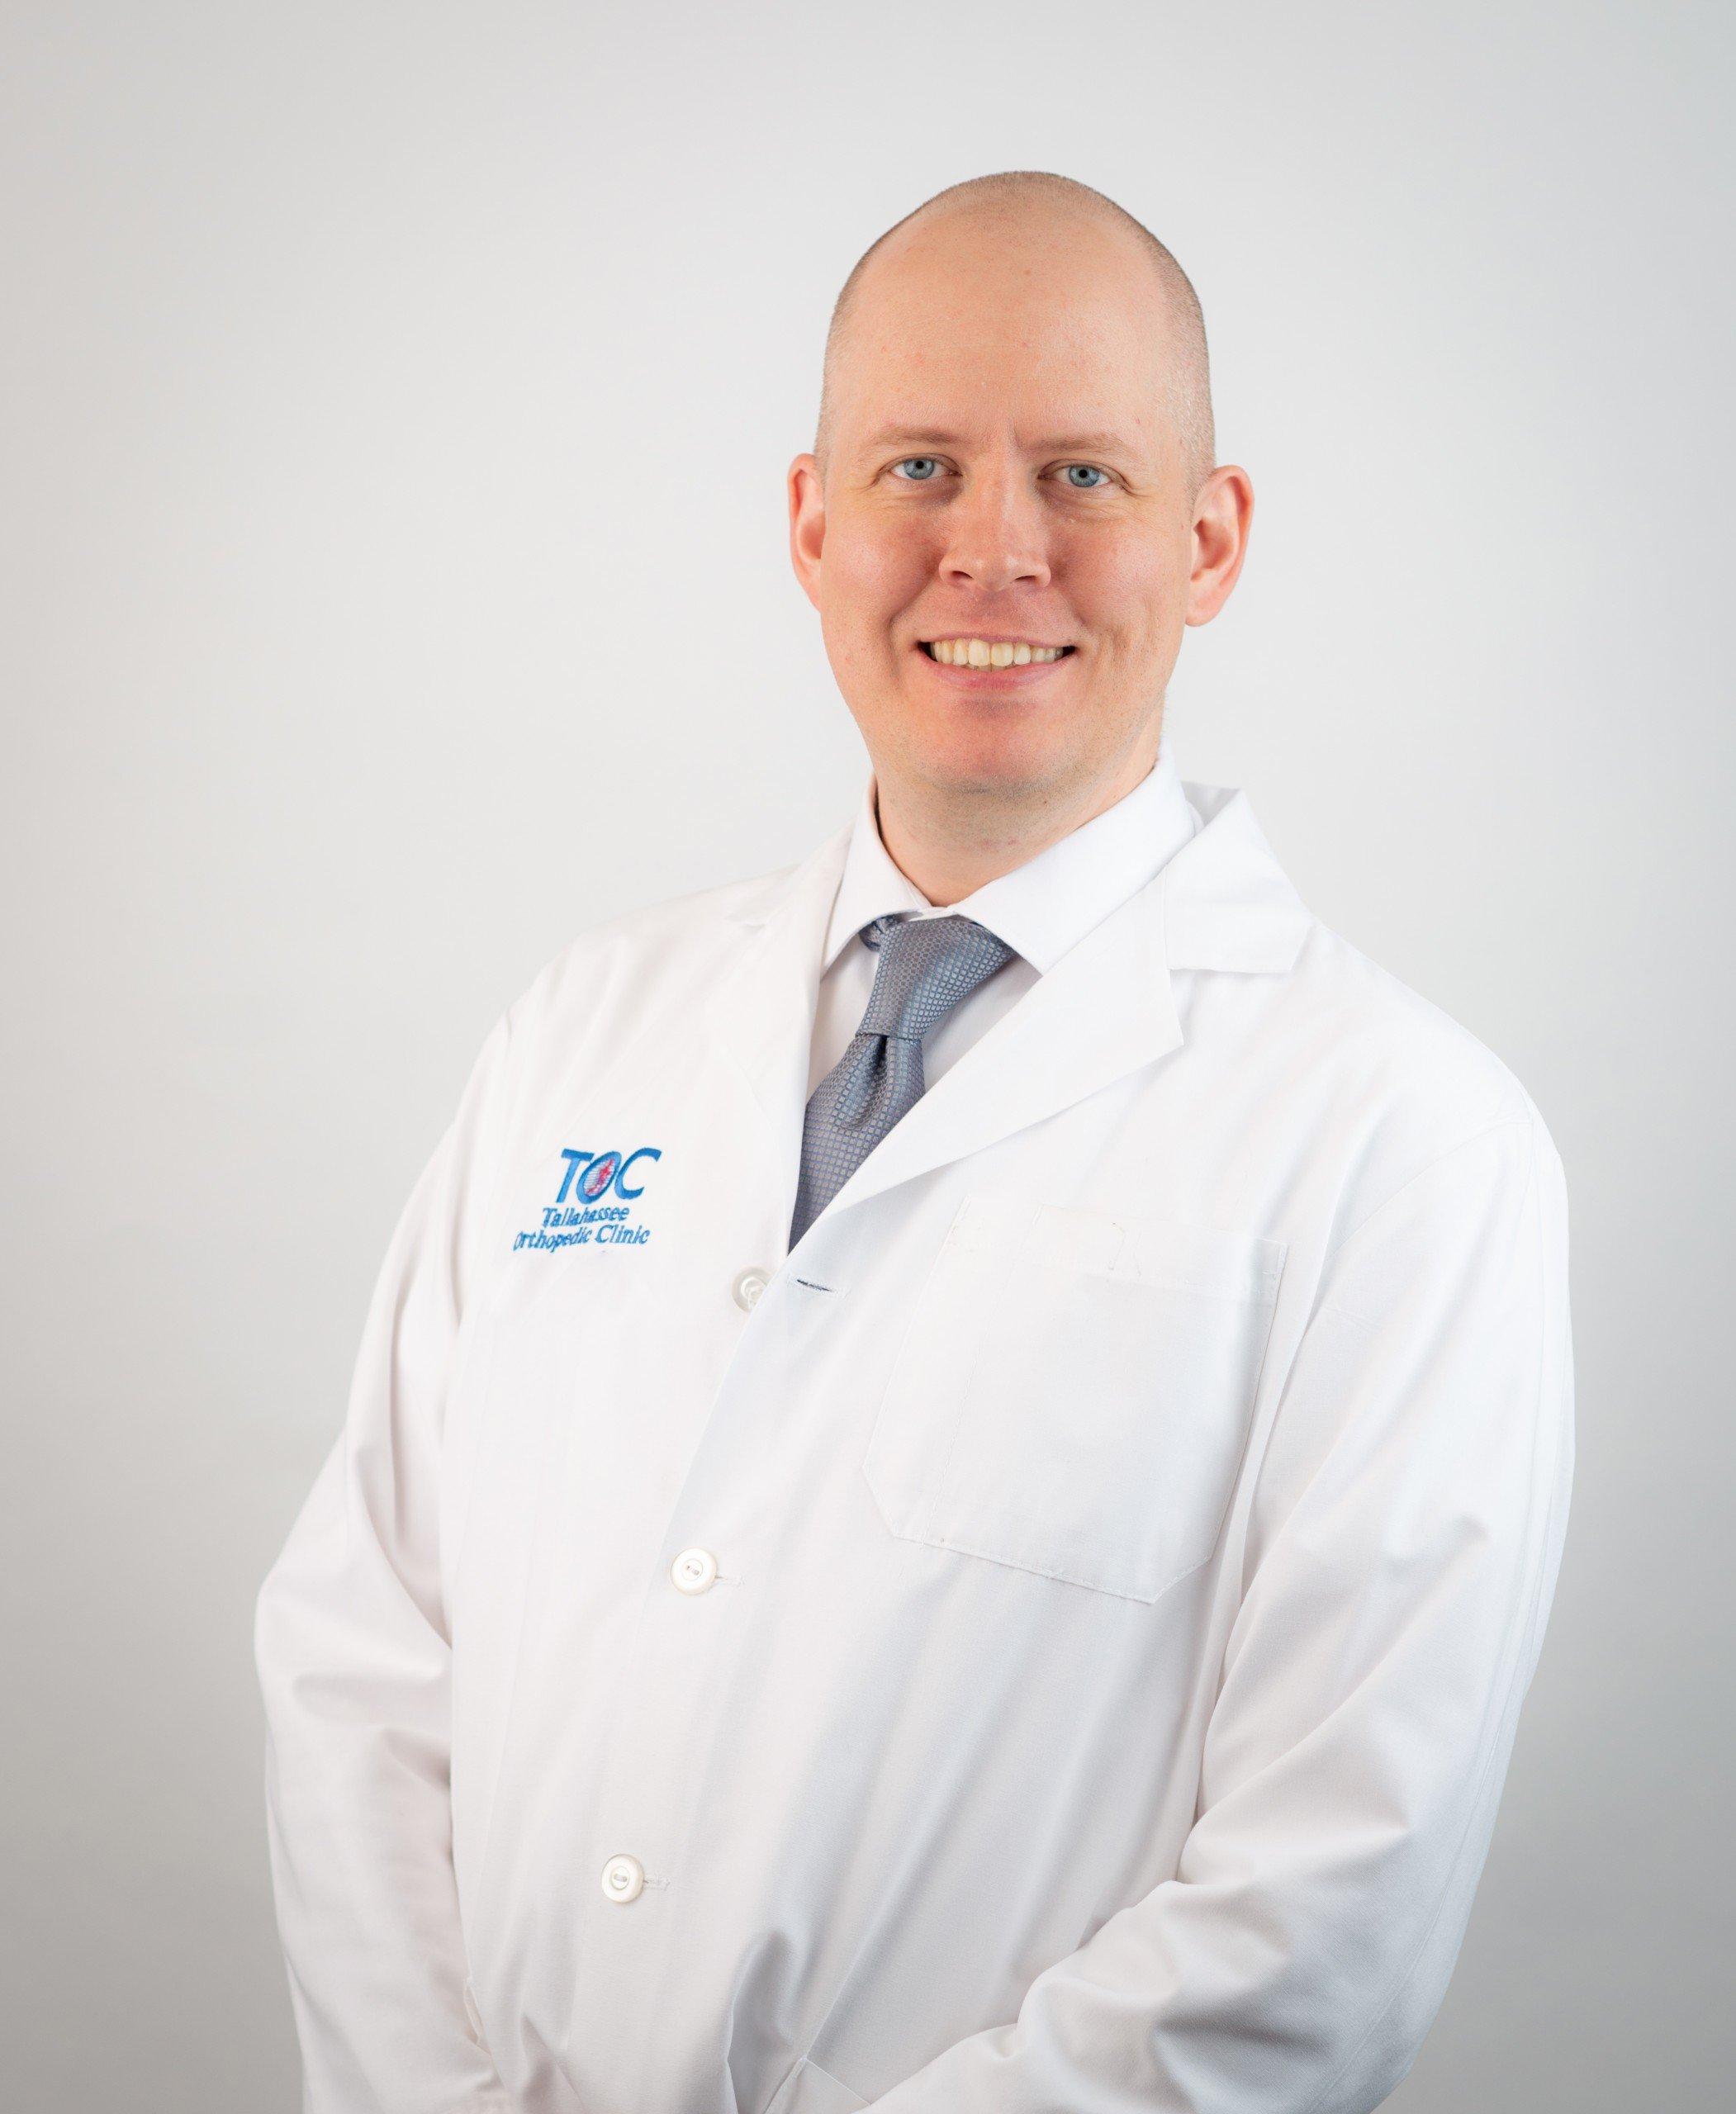 Christopher W. Babl, MD